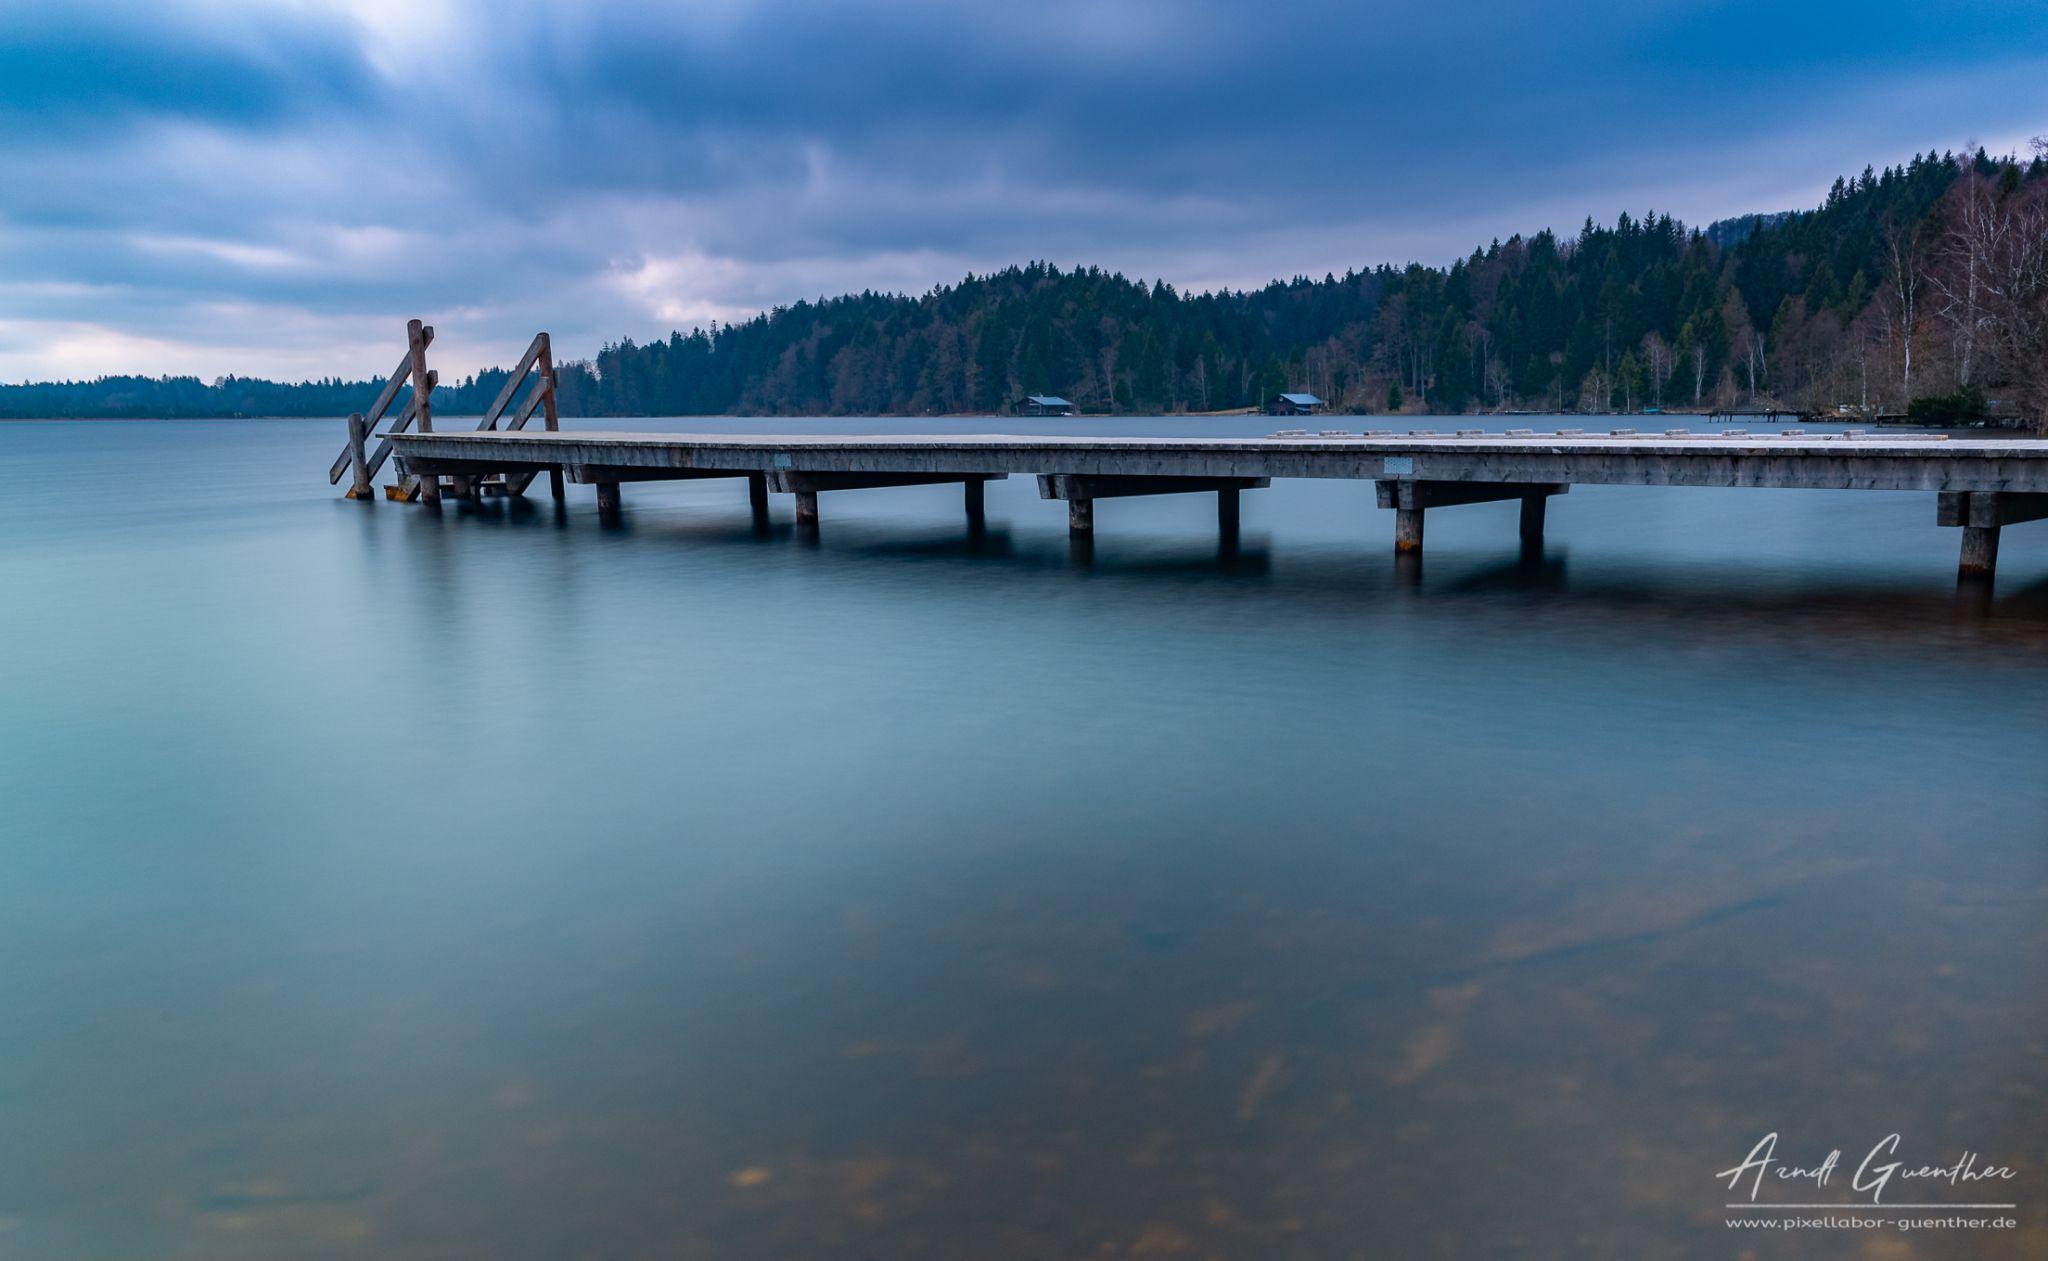 Kirchsee bei Bad Tölz, Germany